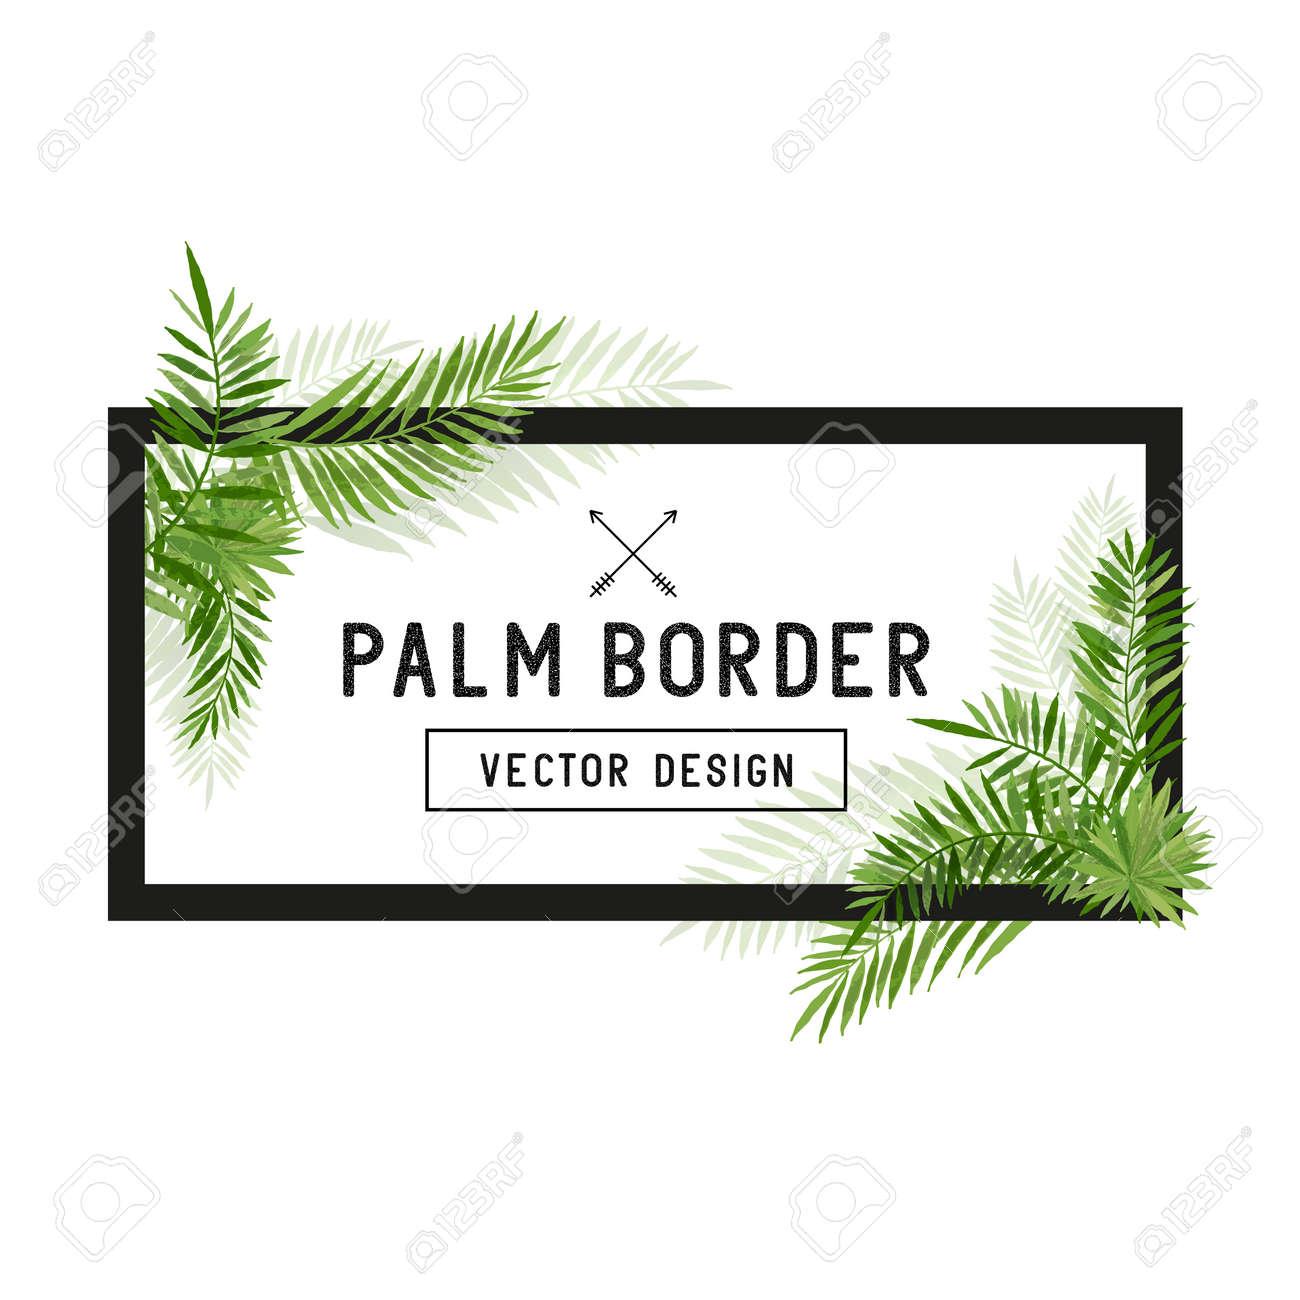 Tropical Palm Leaf Border Vector. Summer Palm tree leaves around a border. Vector illuatration. - 54312251